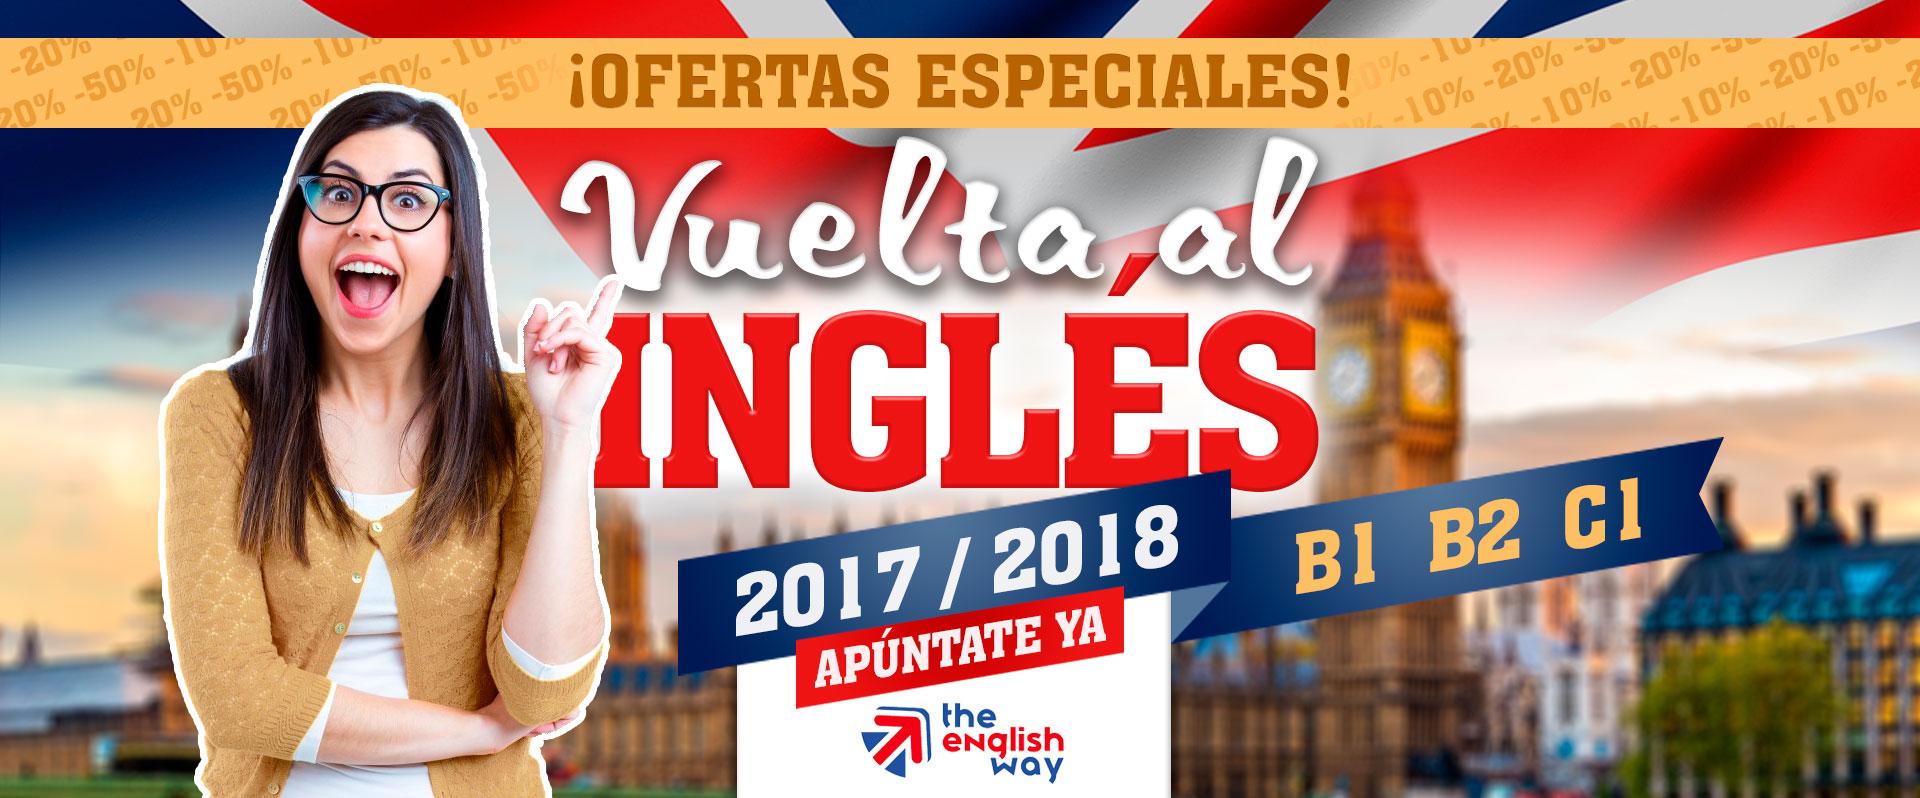 Academia de Inglés 2017 2018 en Zaragoza - The English Way